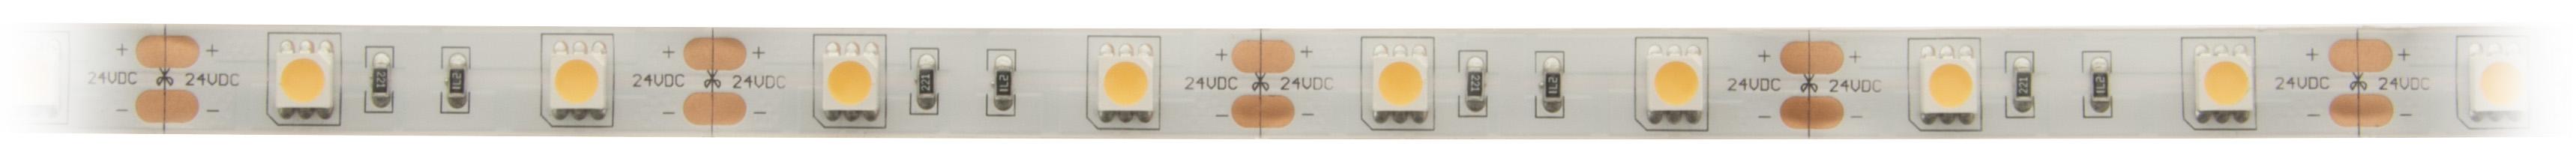 1 Stk FS 35, CLW, Ra=90+, 8W/m, 530lm/m, 24VDC, IP44, l=5m LIFS015000